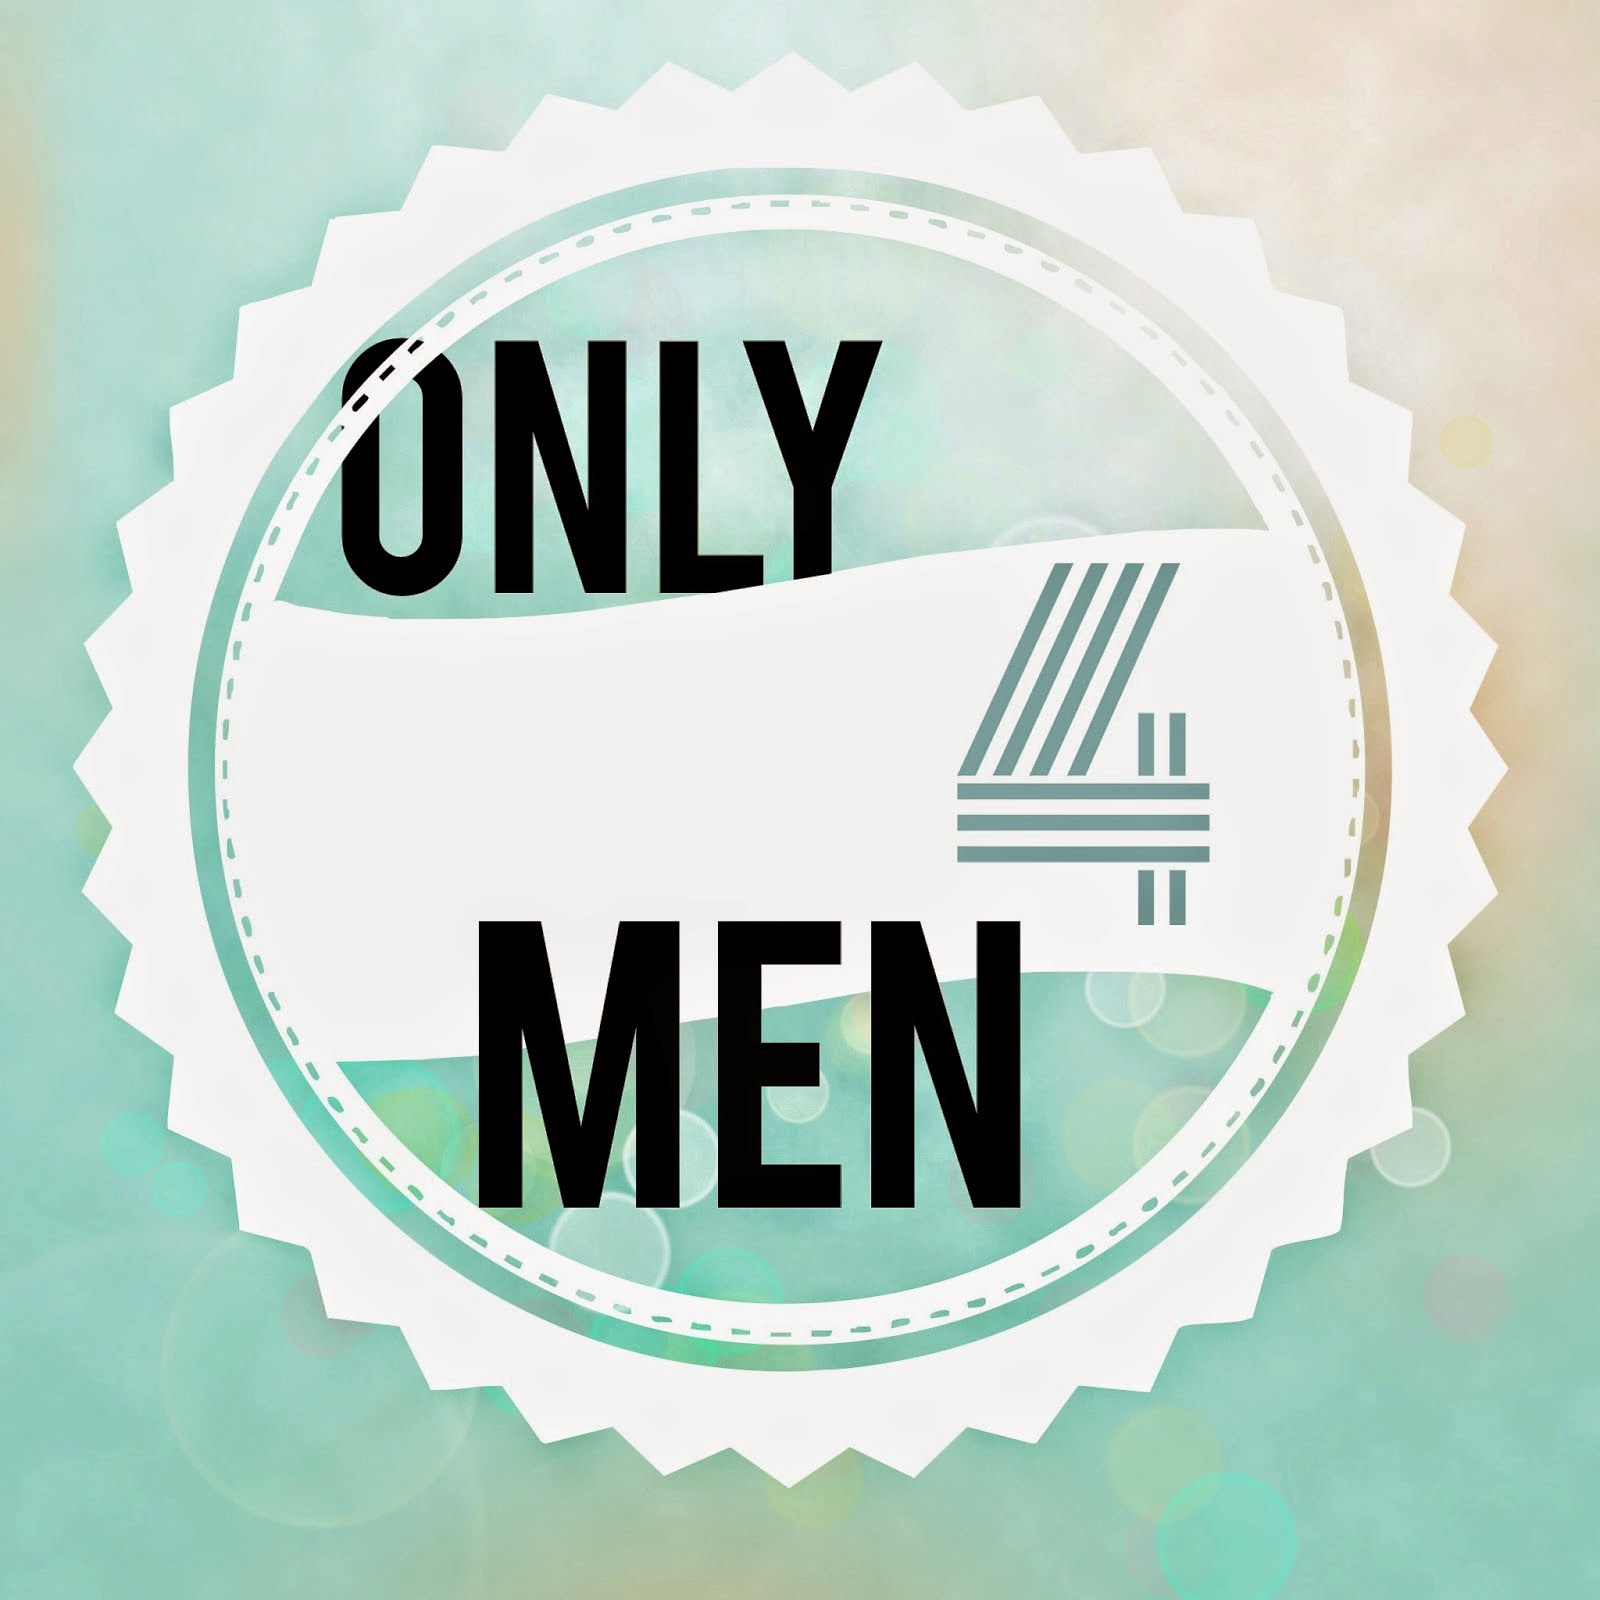 Only 4 Men